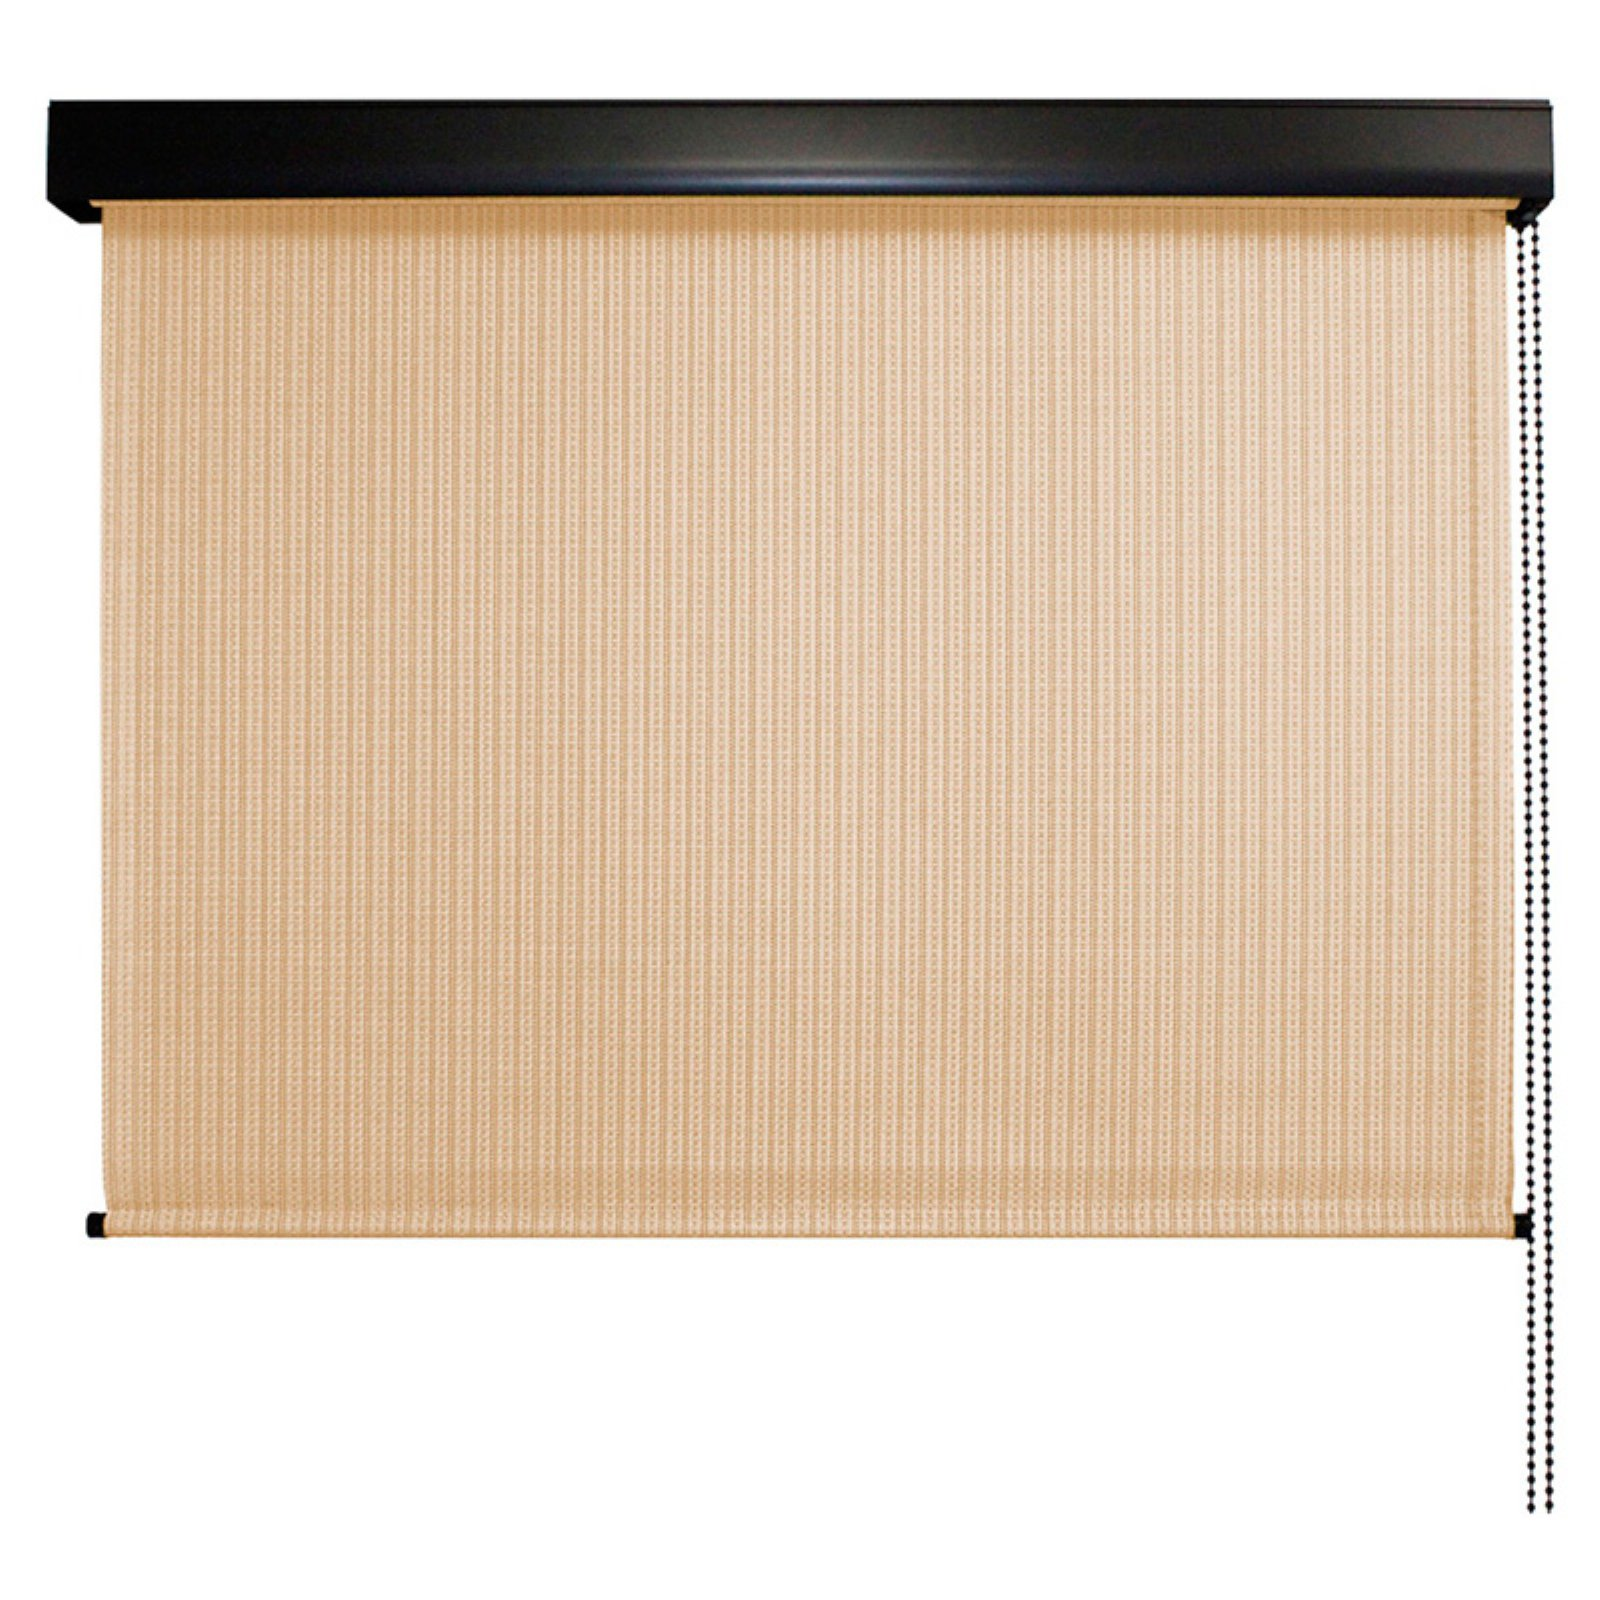 Keystone Fabrics, Valanced, Cord Operated, Outdoor Solar Shade, 8' Wide x 8' Drop, Telluride